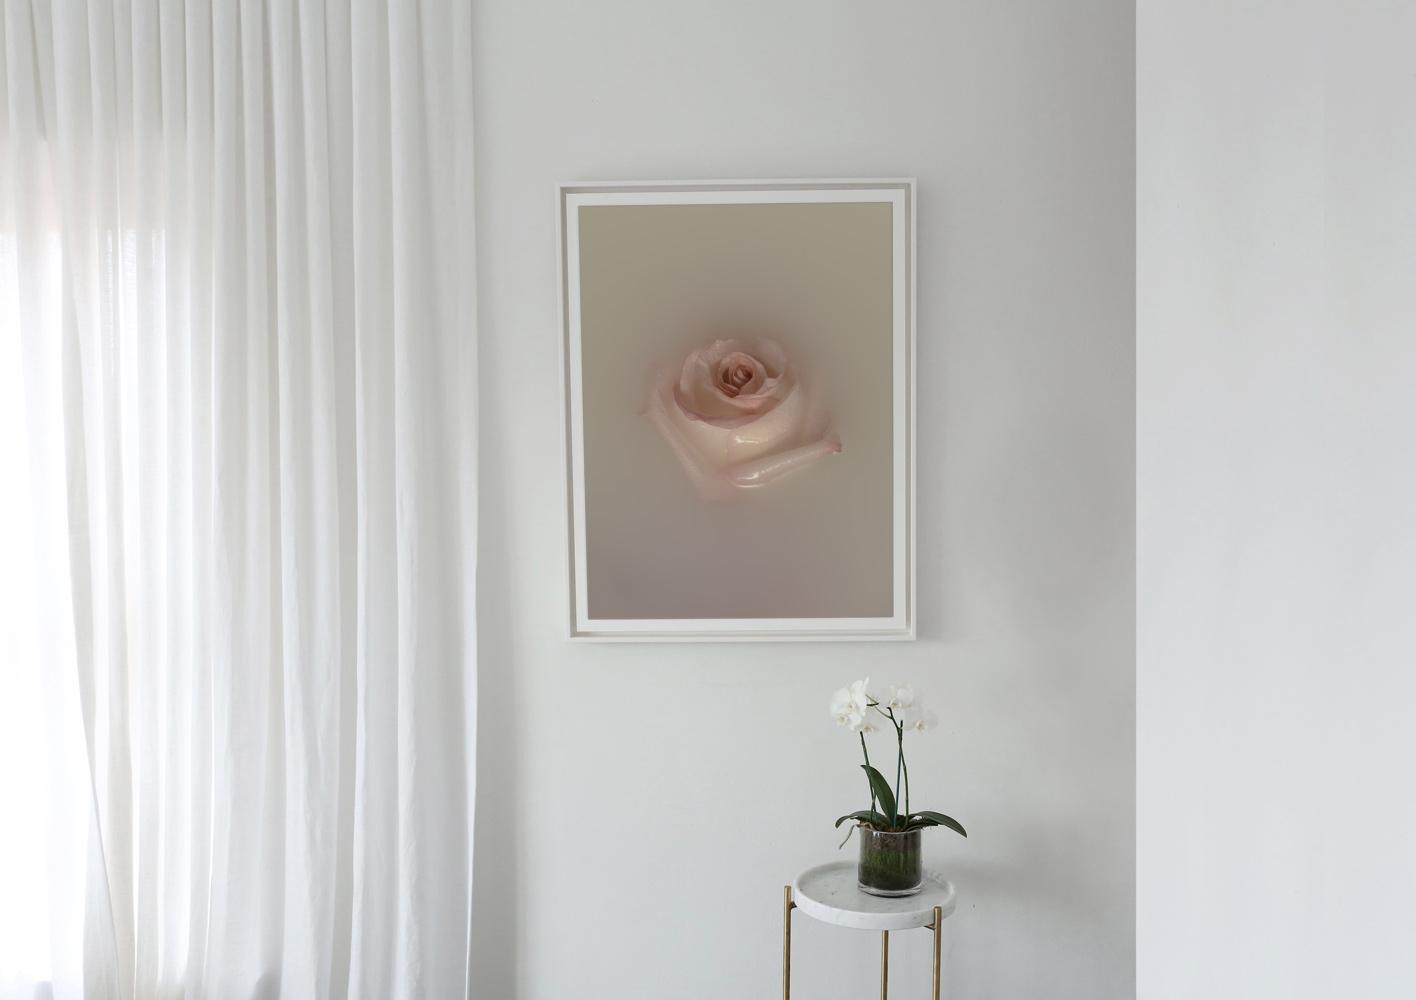 BATH-PRINT-ROSE